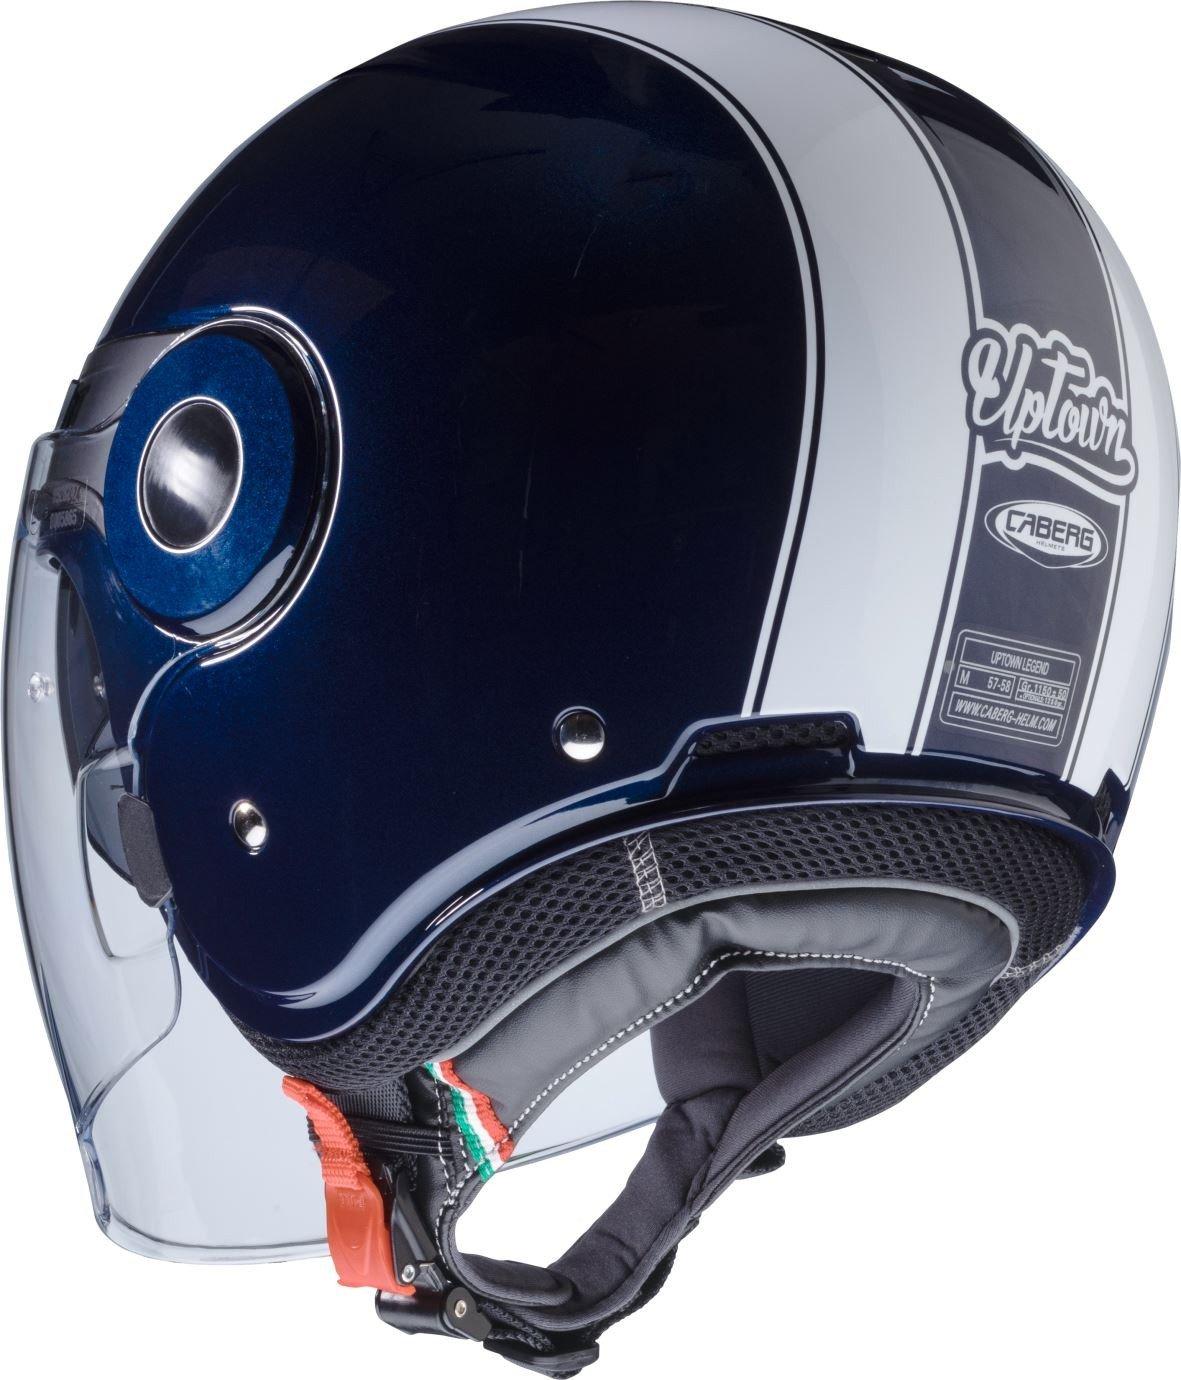 casco integrale Duke Legend Caberg